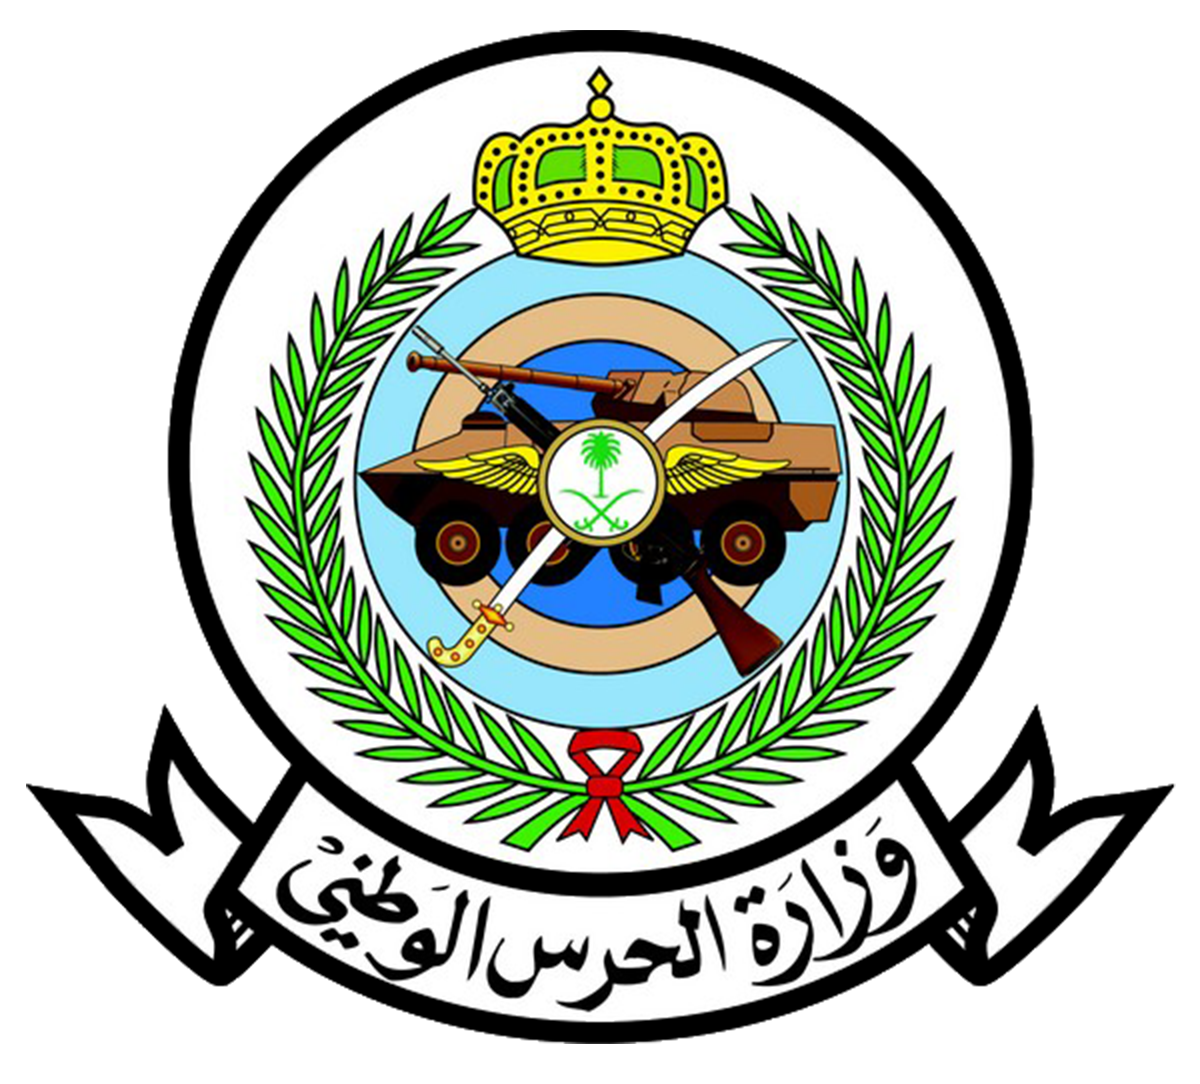 Saudi Arabian National Guard Logos